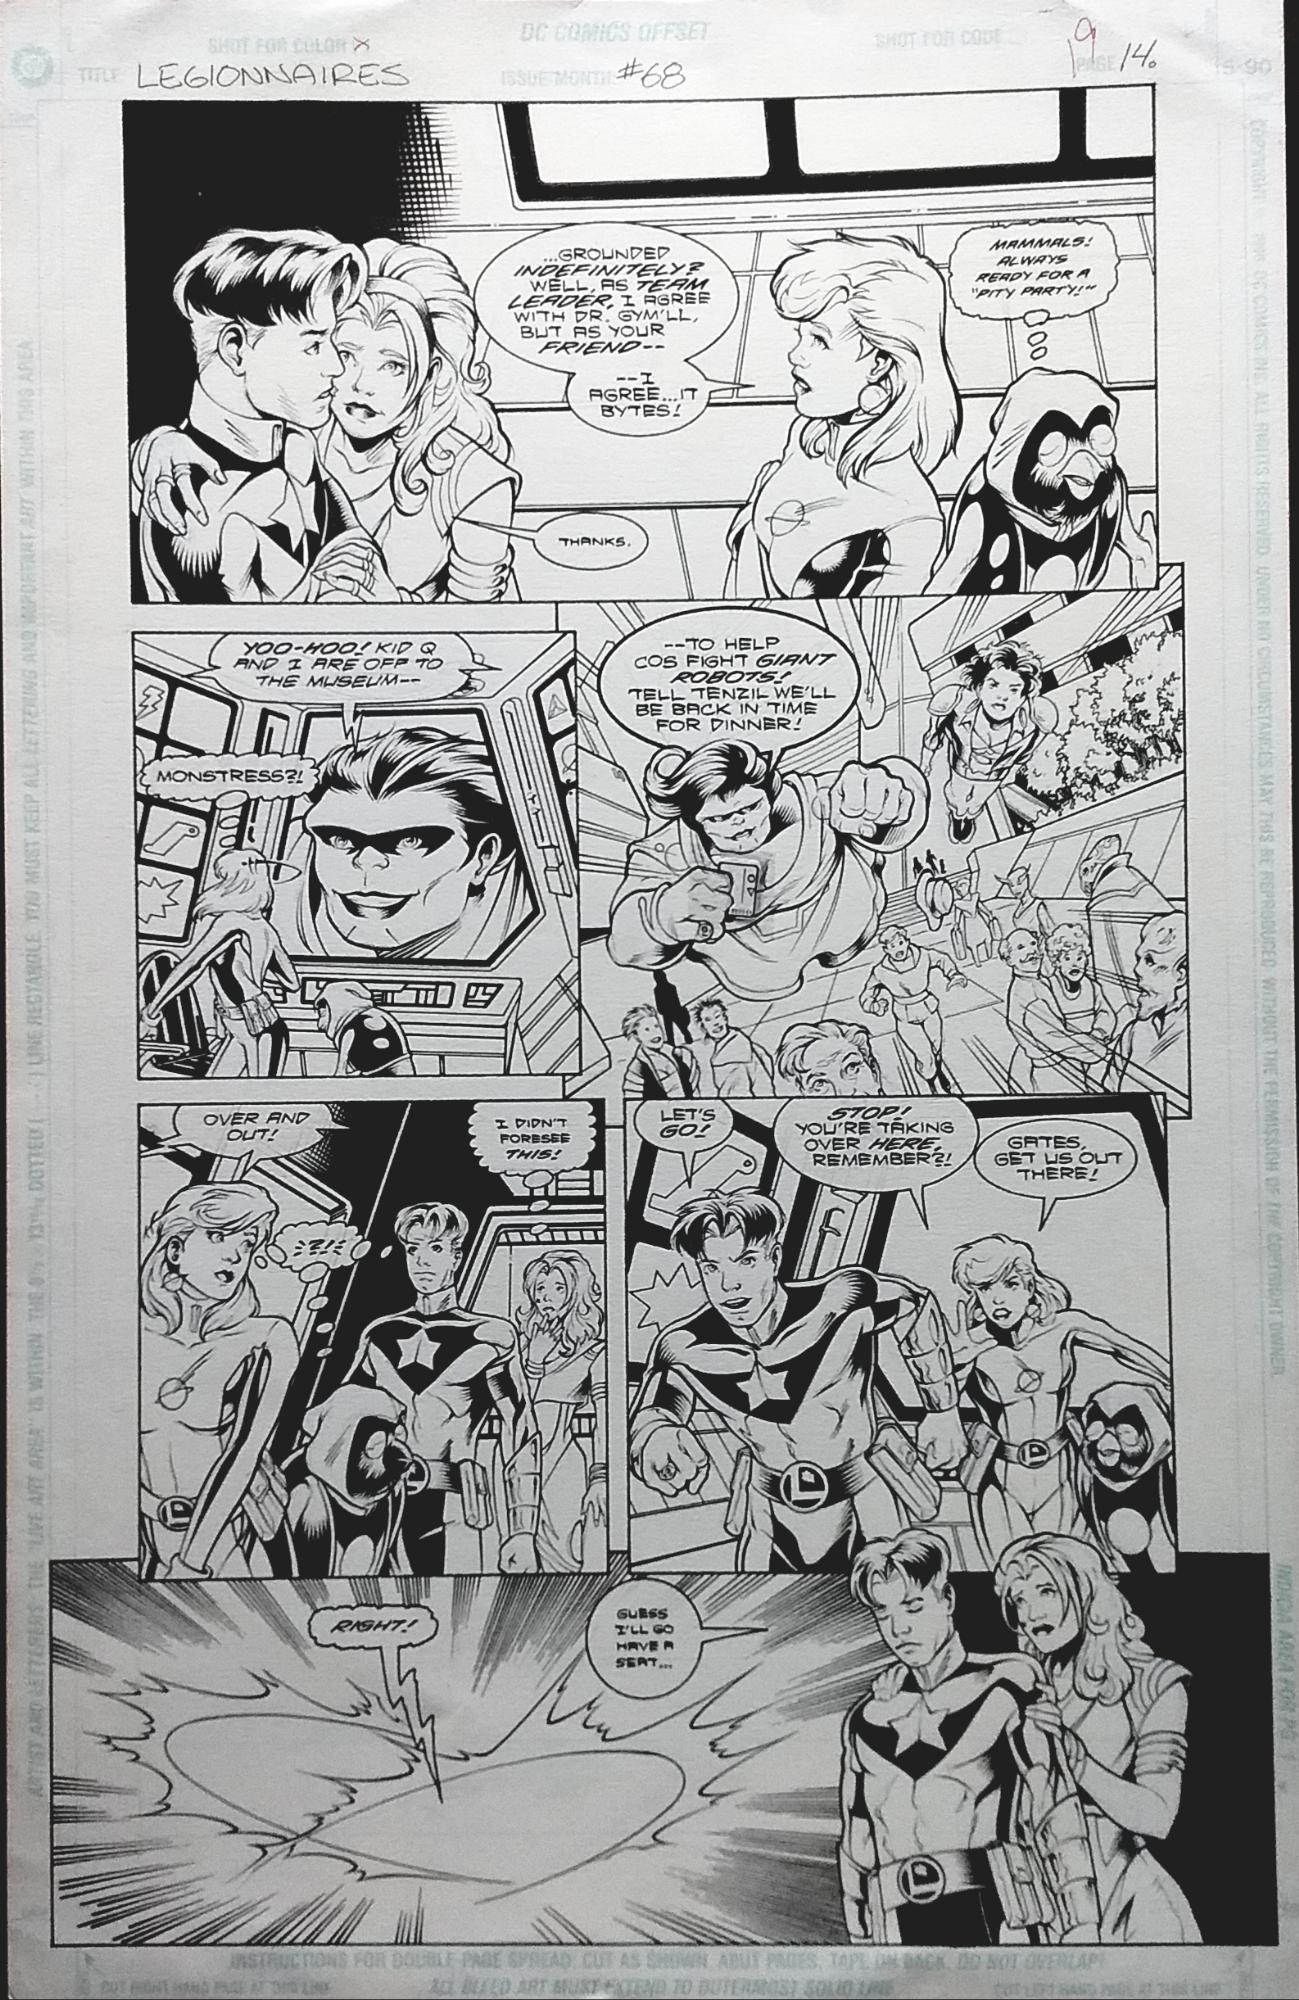 Legionnaires #68 (1998) Star Boy, Saturn Girl, Monstress, in